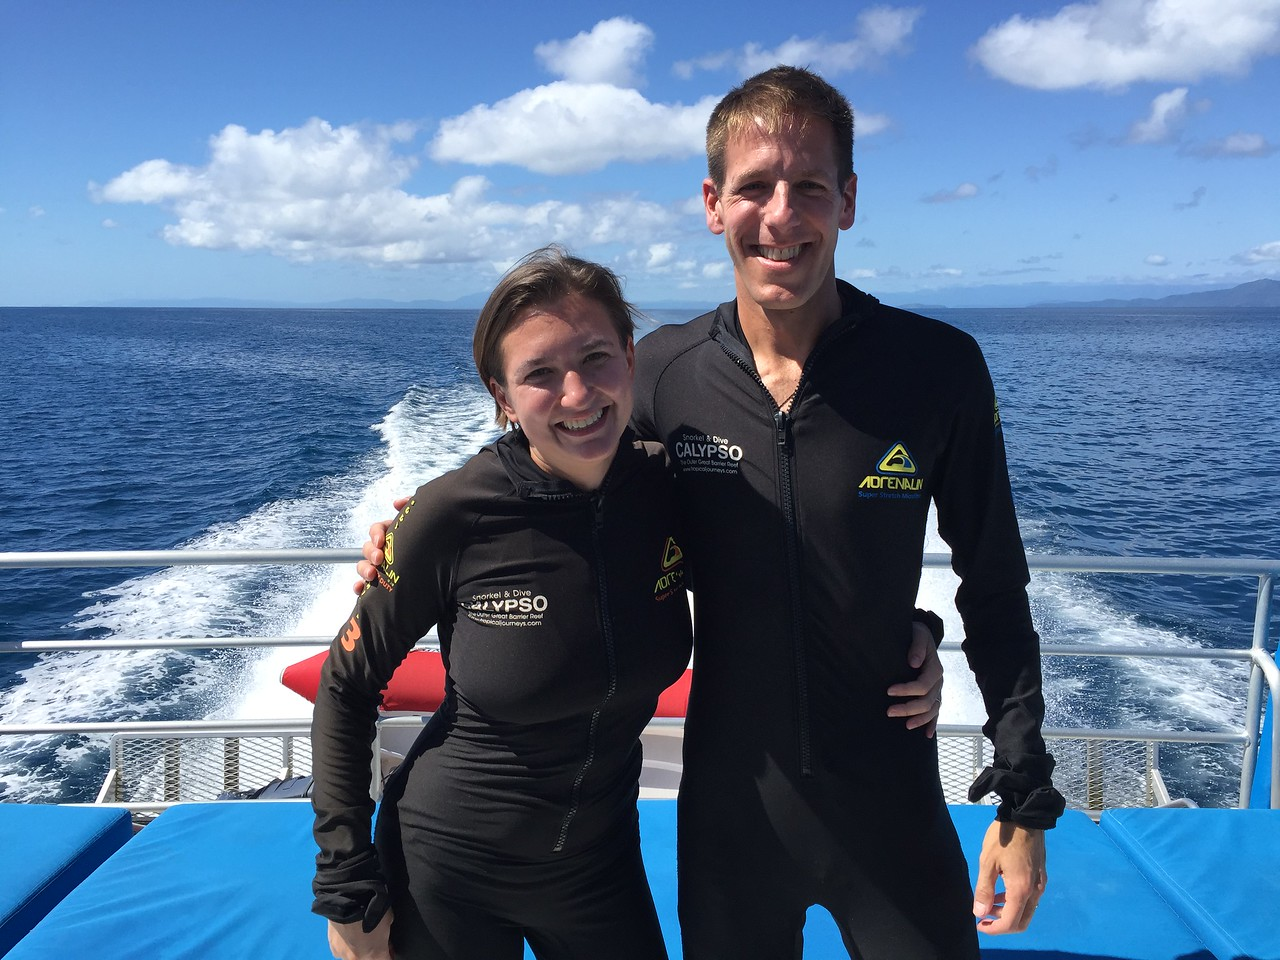 Before Going Scuba Diving on Great Barrier Reef - Queensland, Australia